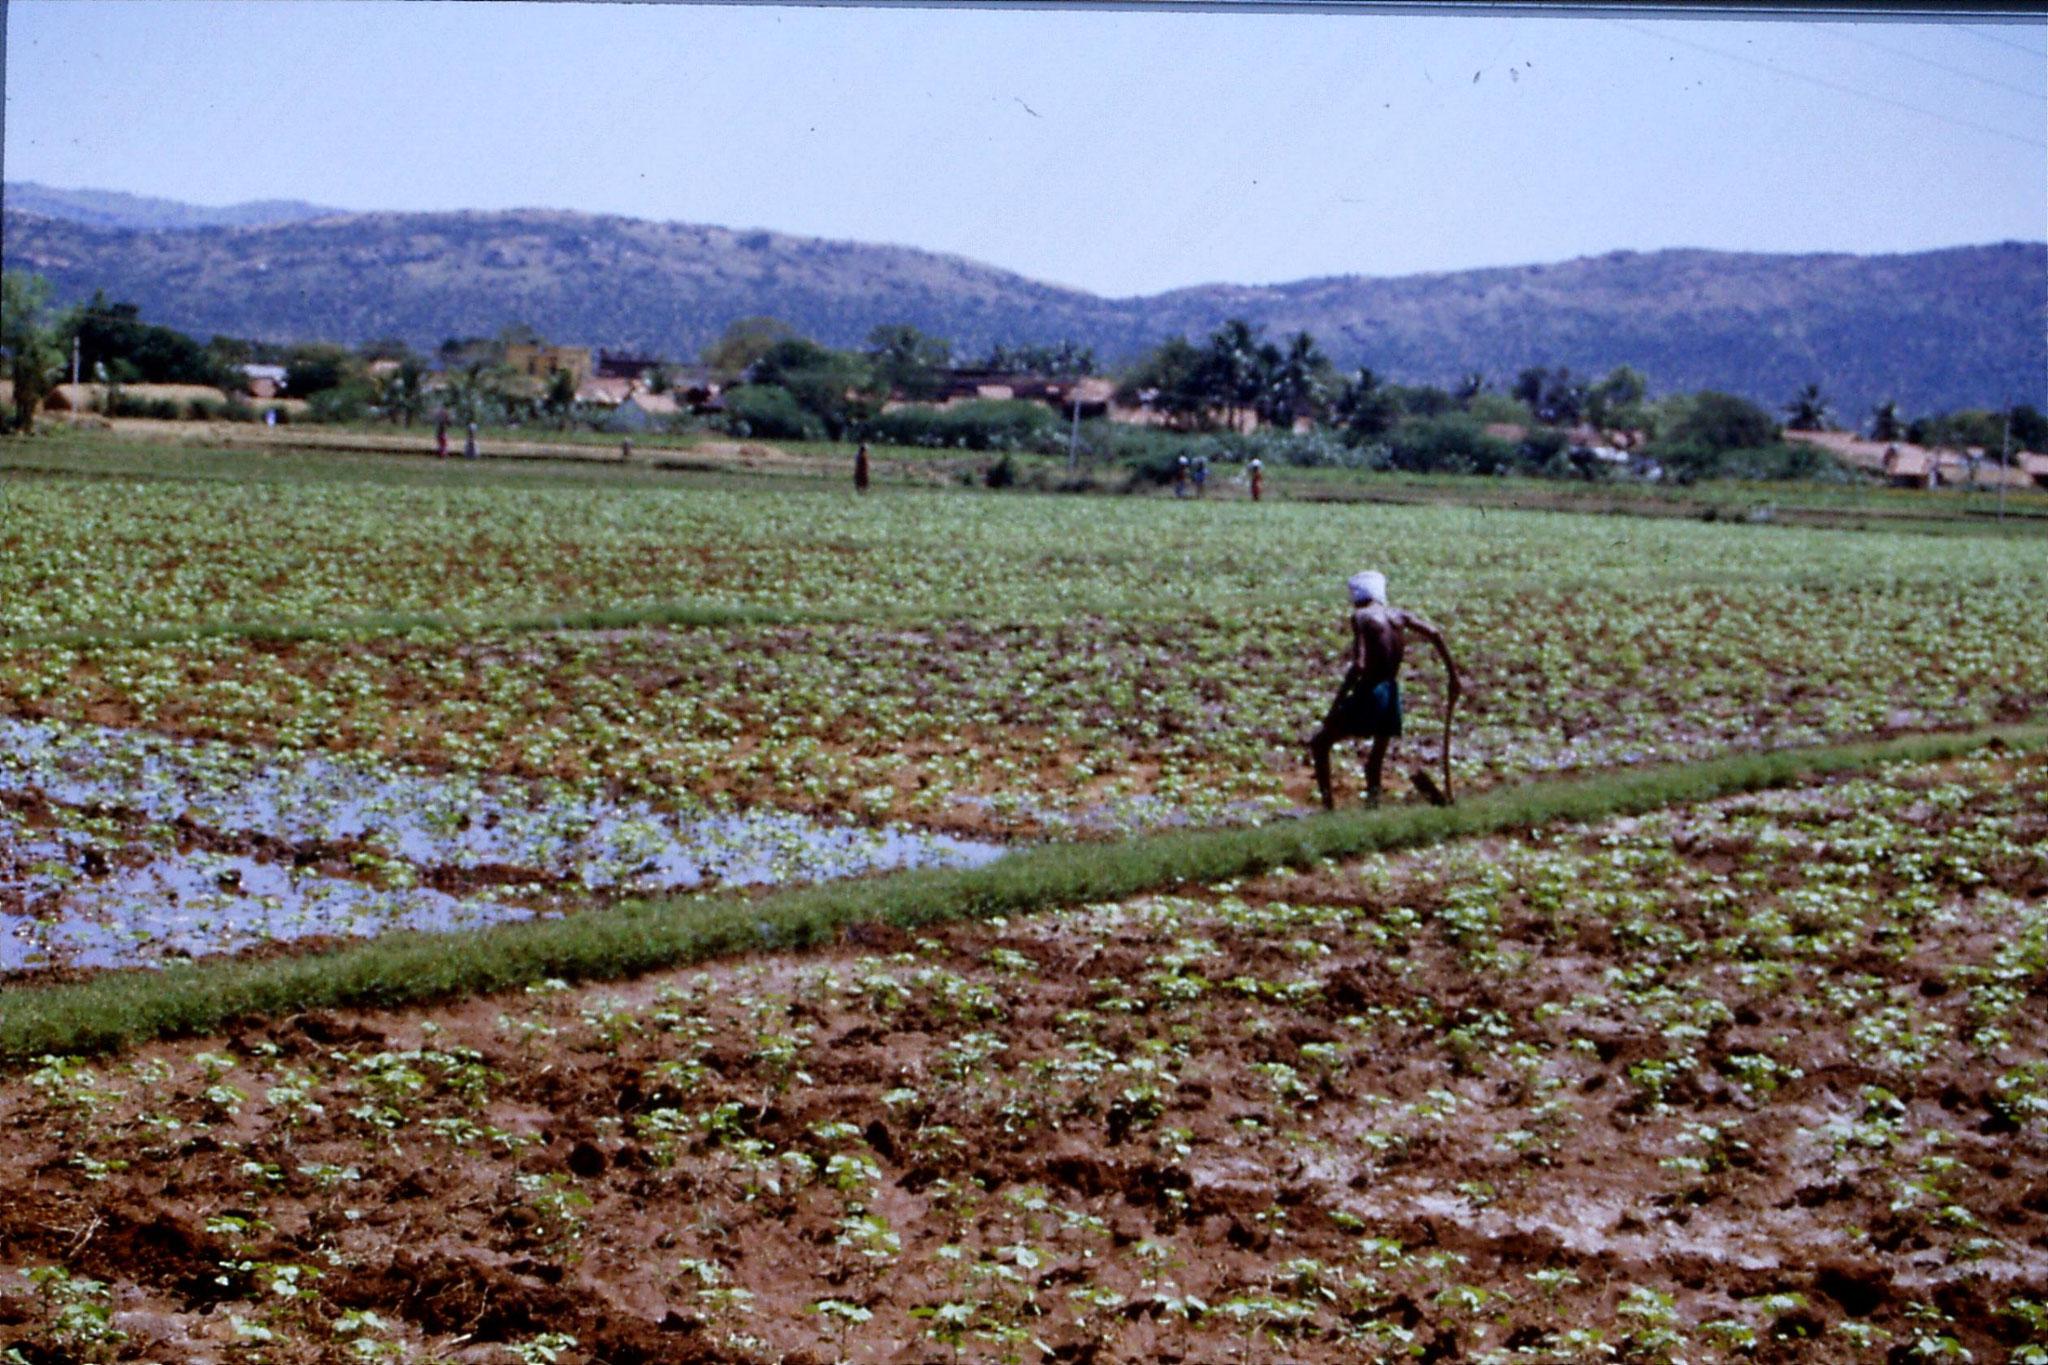 104/29: 21/2/1990 Batlagundi afforestation project